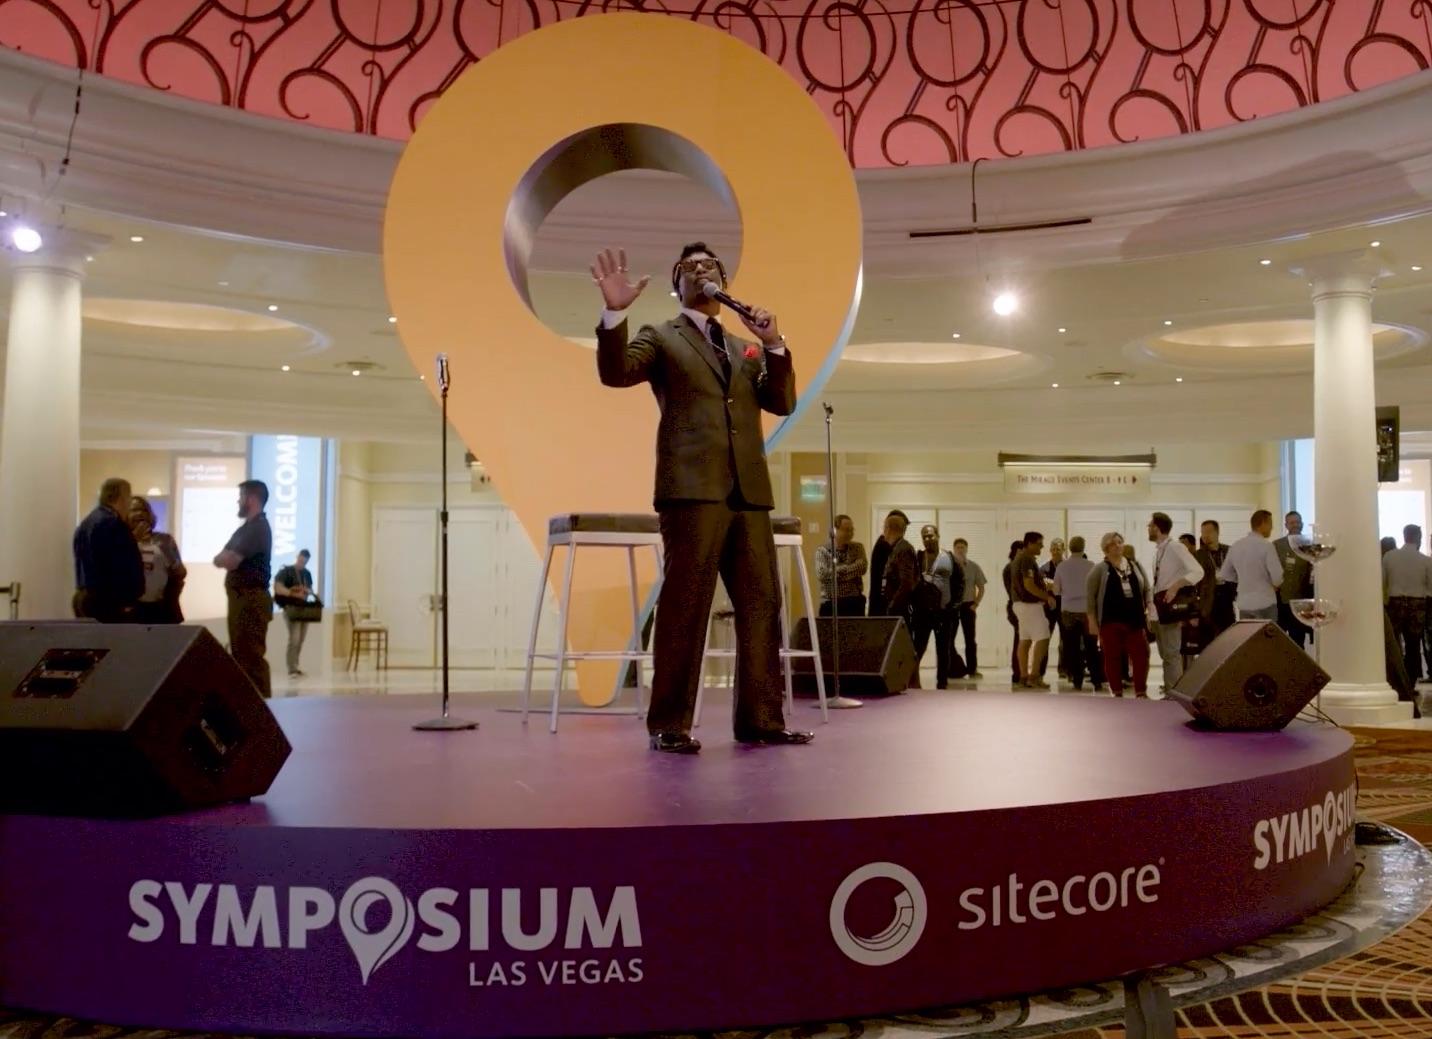 sitecore-symposium-2017-las-vegas